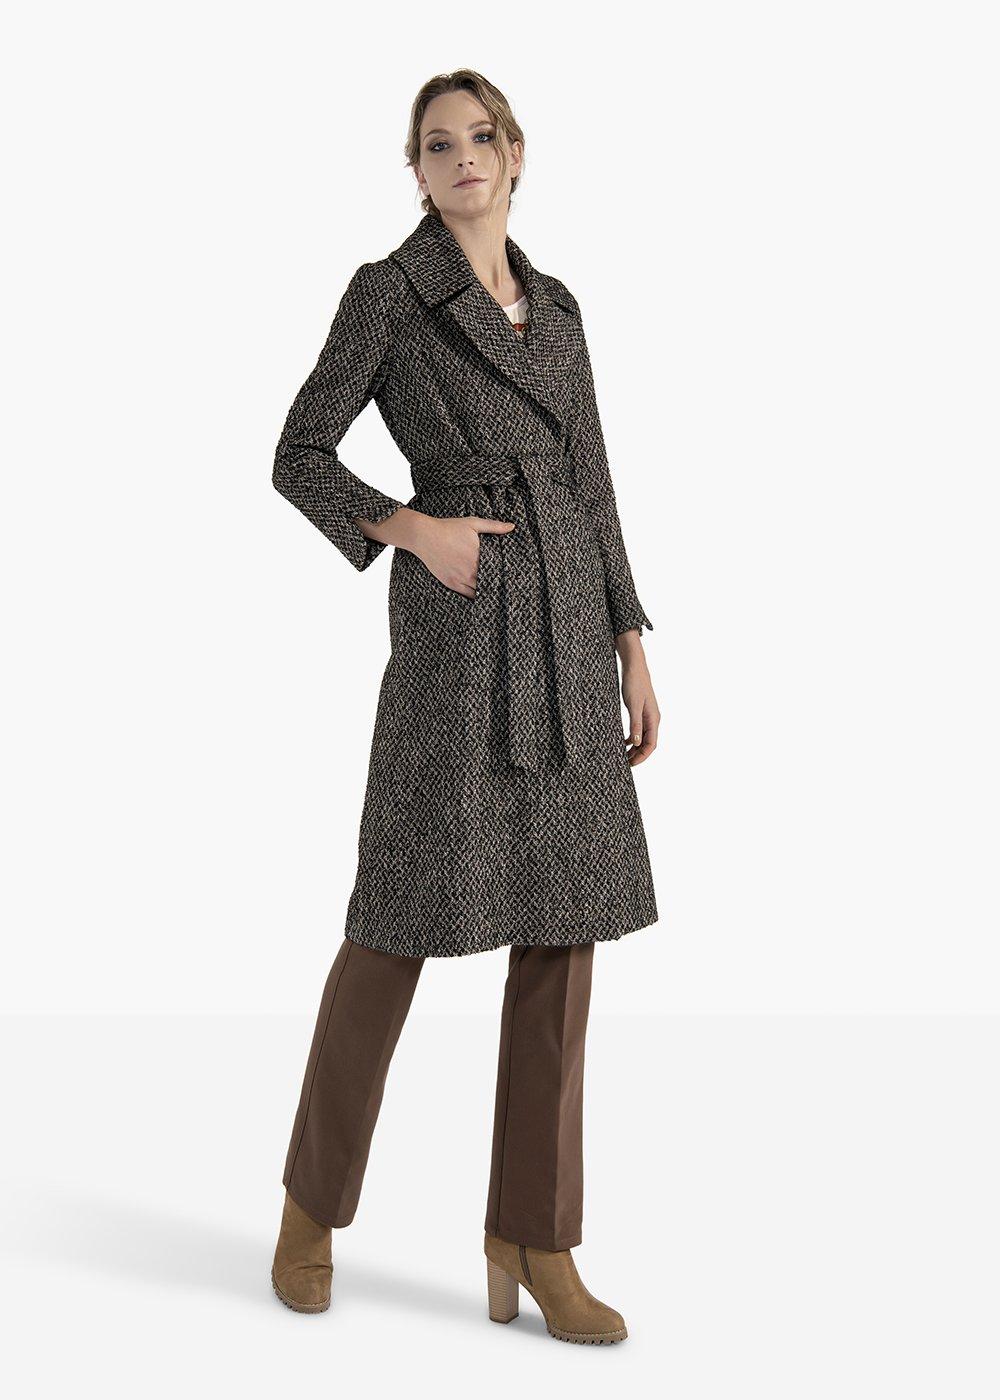 Double-breasted coat Charles in herringbone fabric - Black / Grezzo Fantasia - Woman